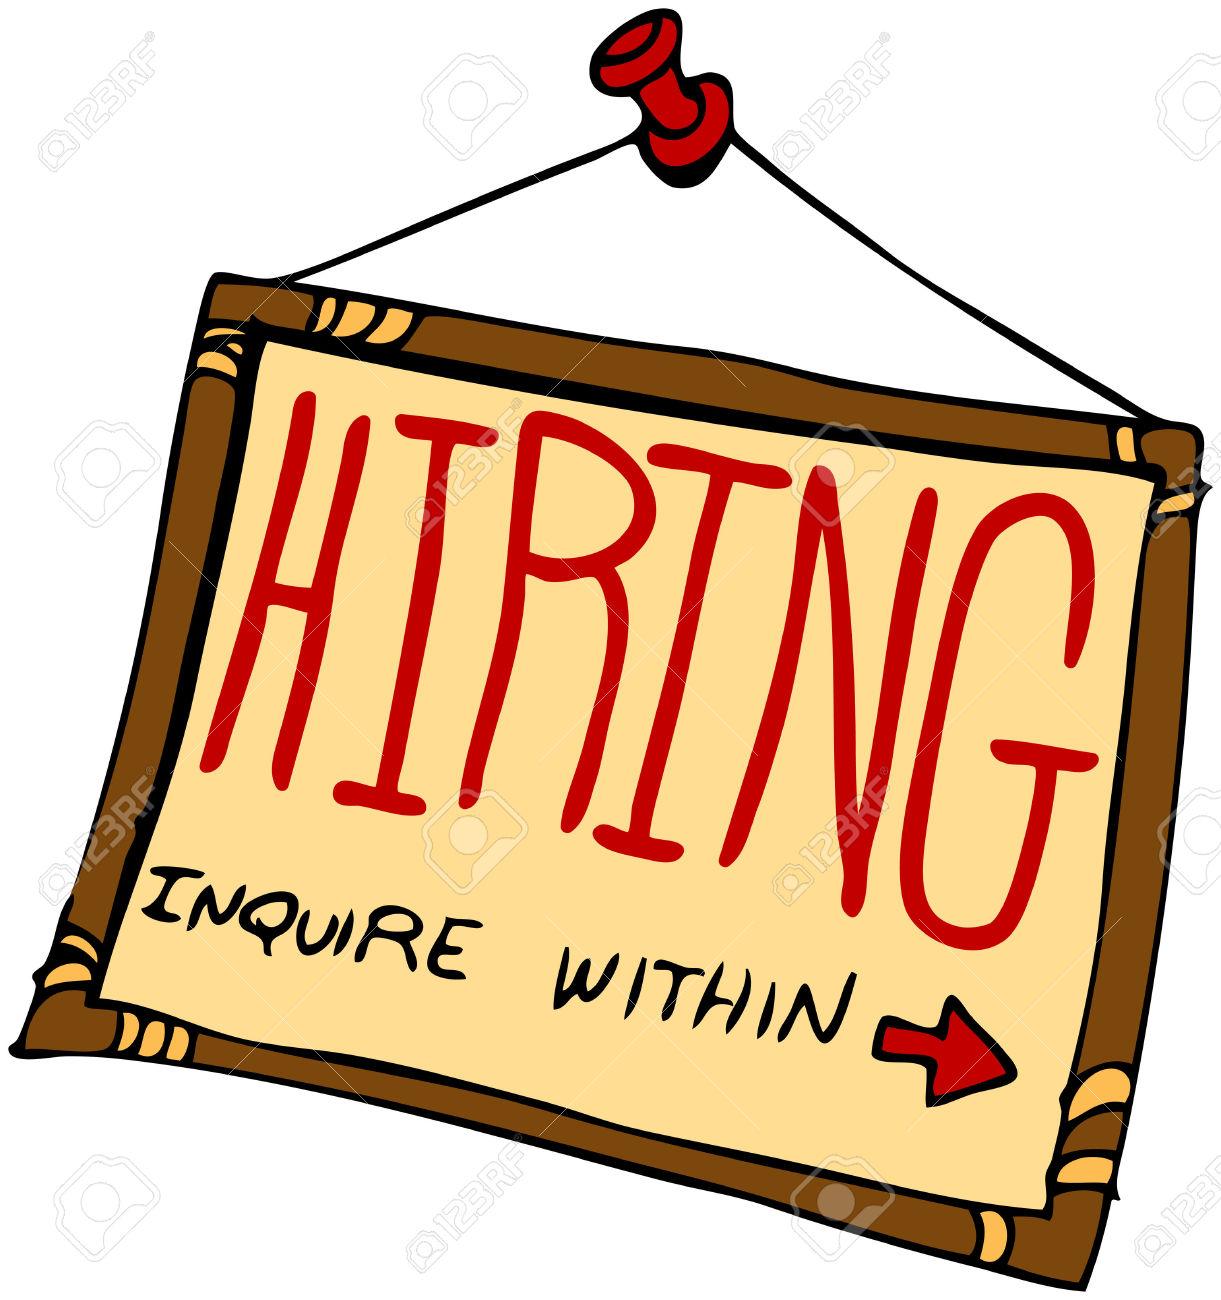 An image of a hiring sign .